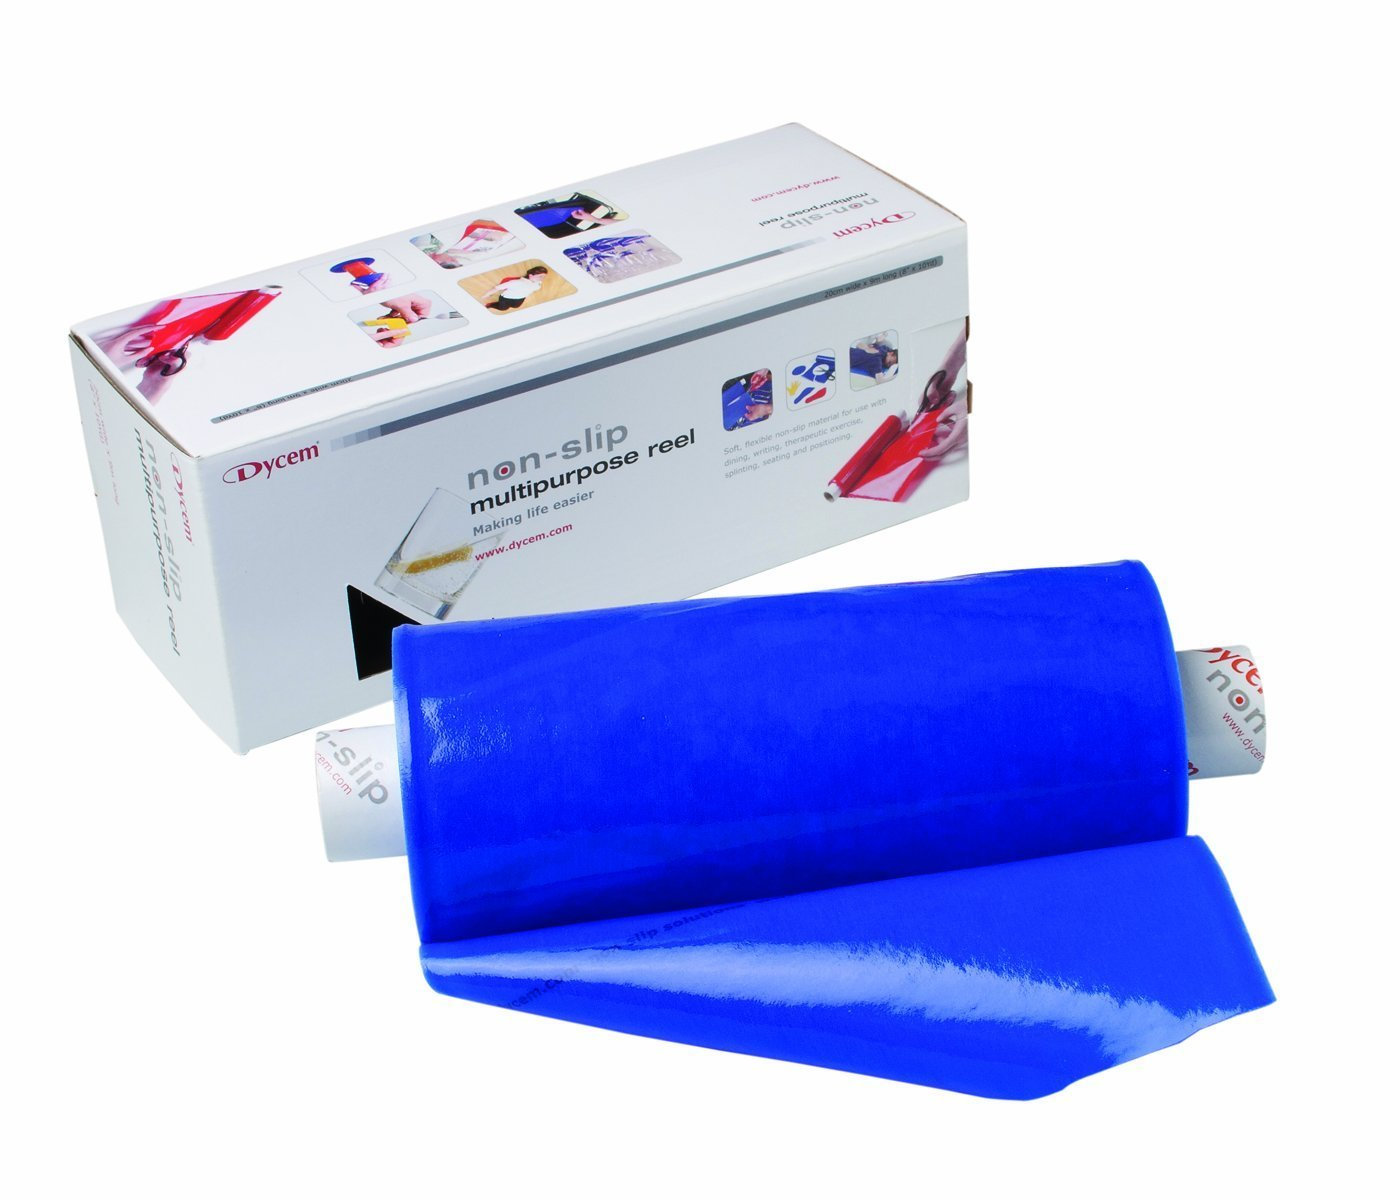 Dycem??non-slip material, roll, 8''x6-1/2 foot, blue by Dycem_ by Dycem